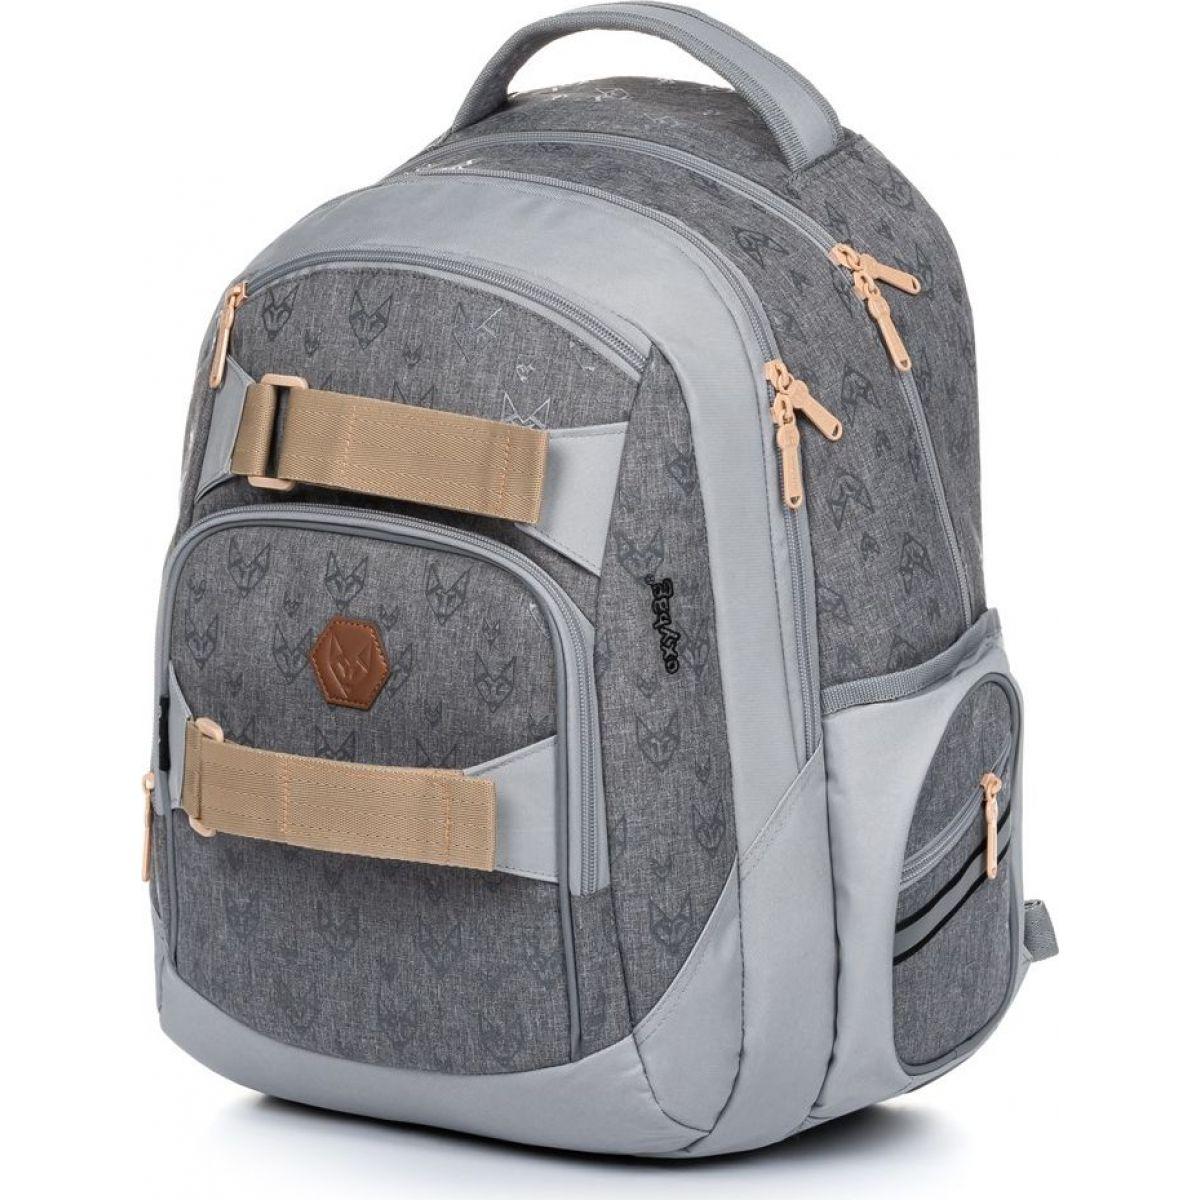 Karton P + P Študentský batoh Oxy Style Fox